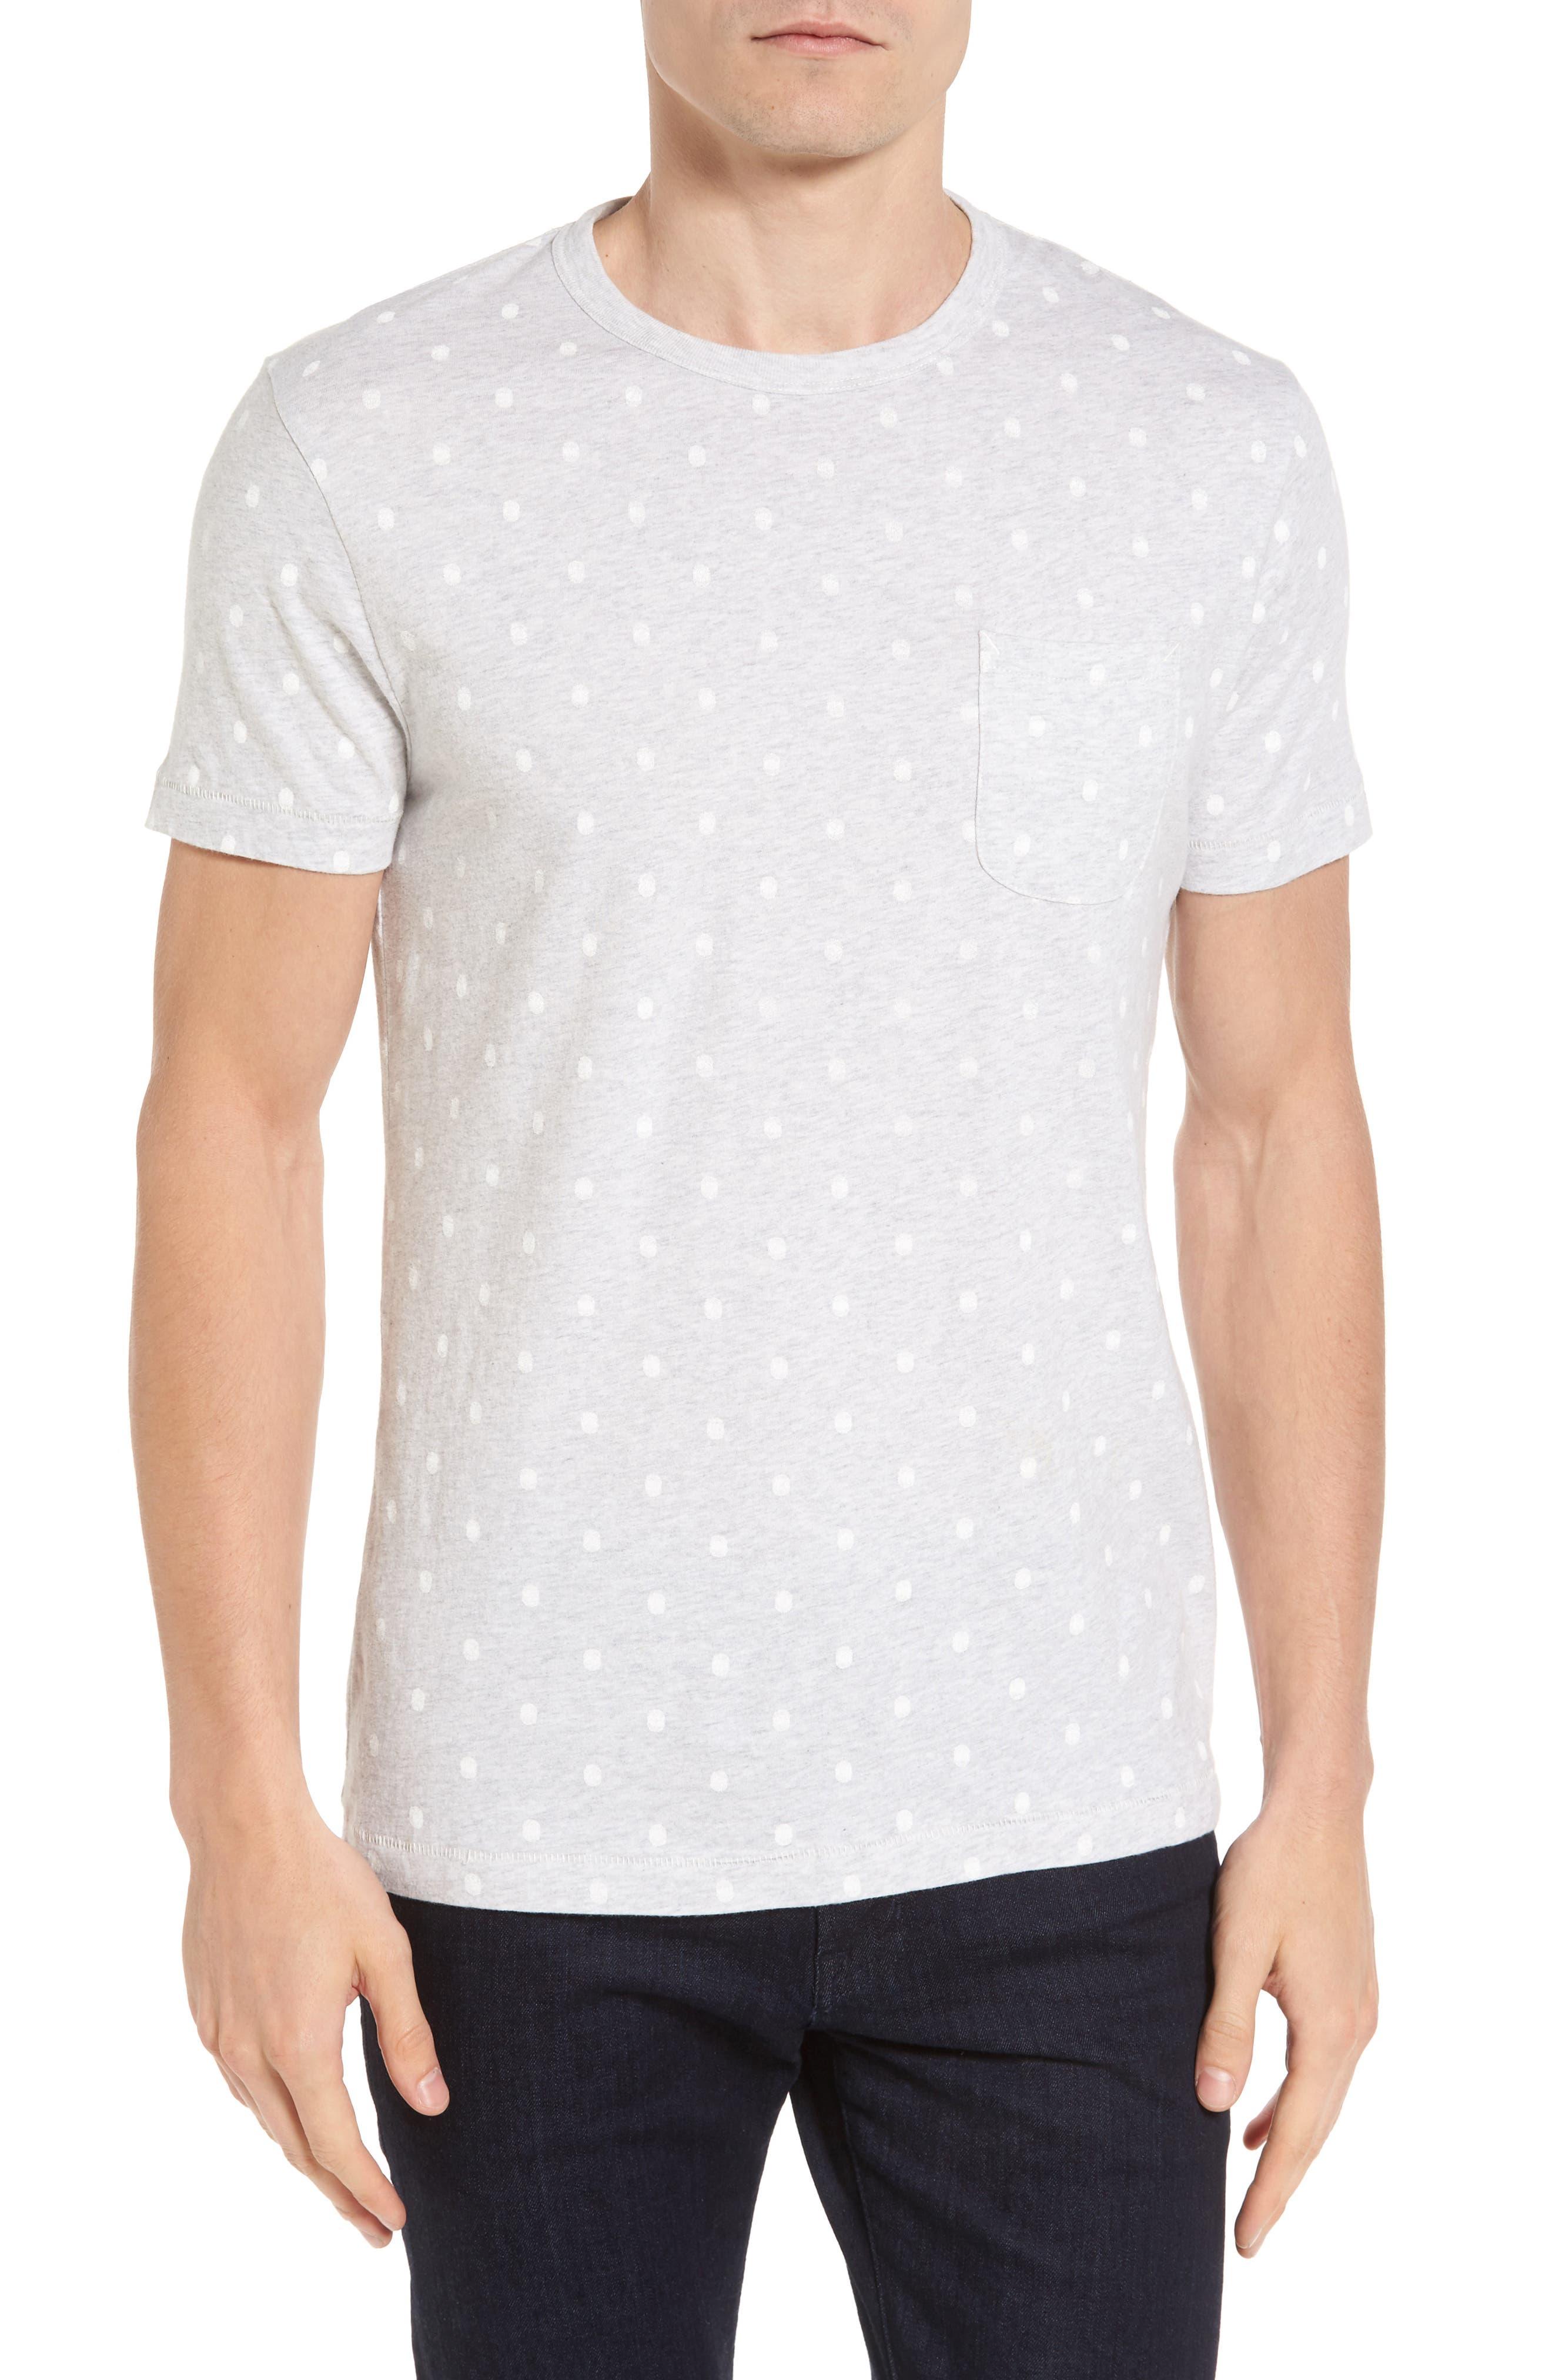 Main Image - French Connection Polka Dot T-Shirt